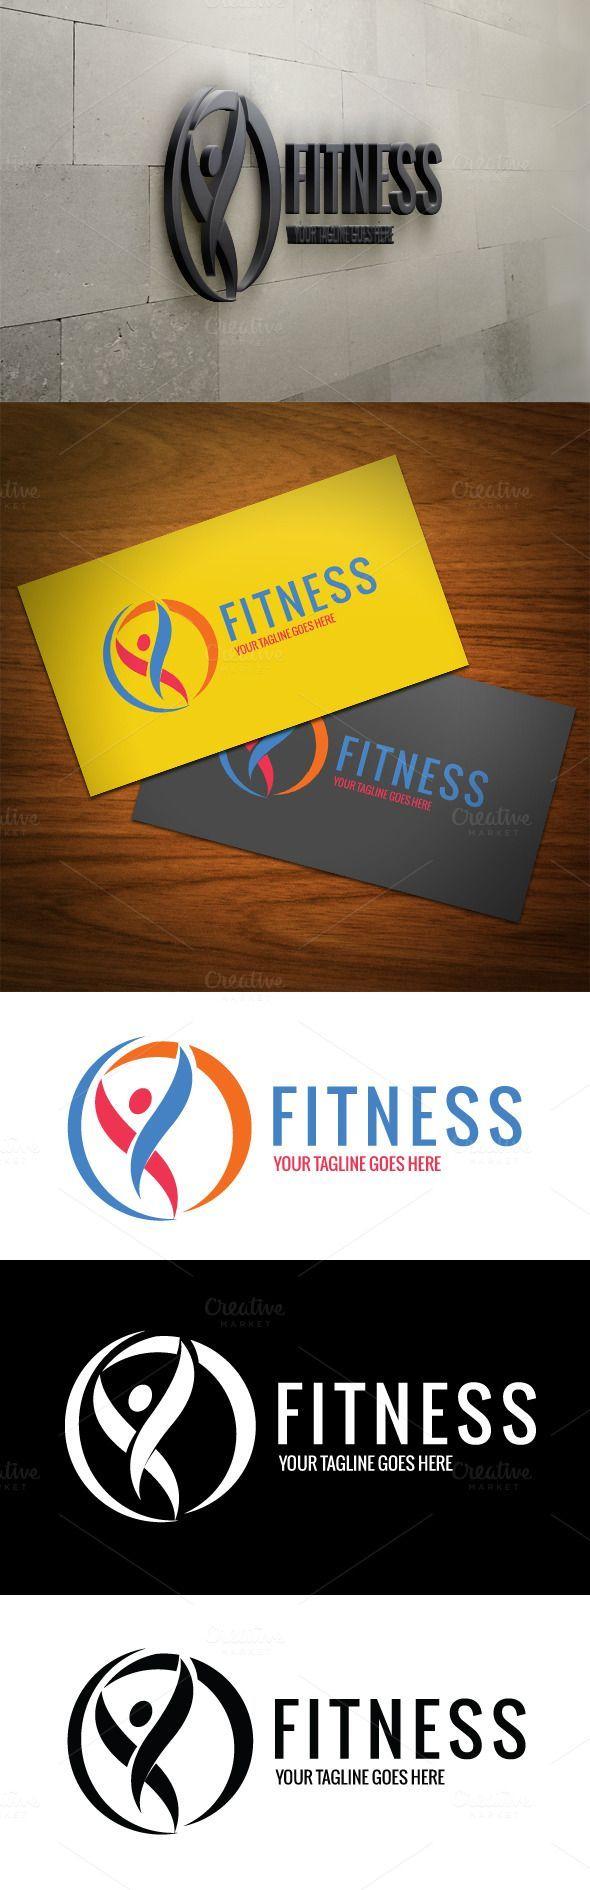 #designmarket #creative #fitness #market #fresh #logo #by #onFresh Fitness Logo by DesignMarket on C...